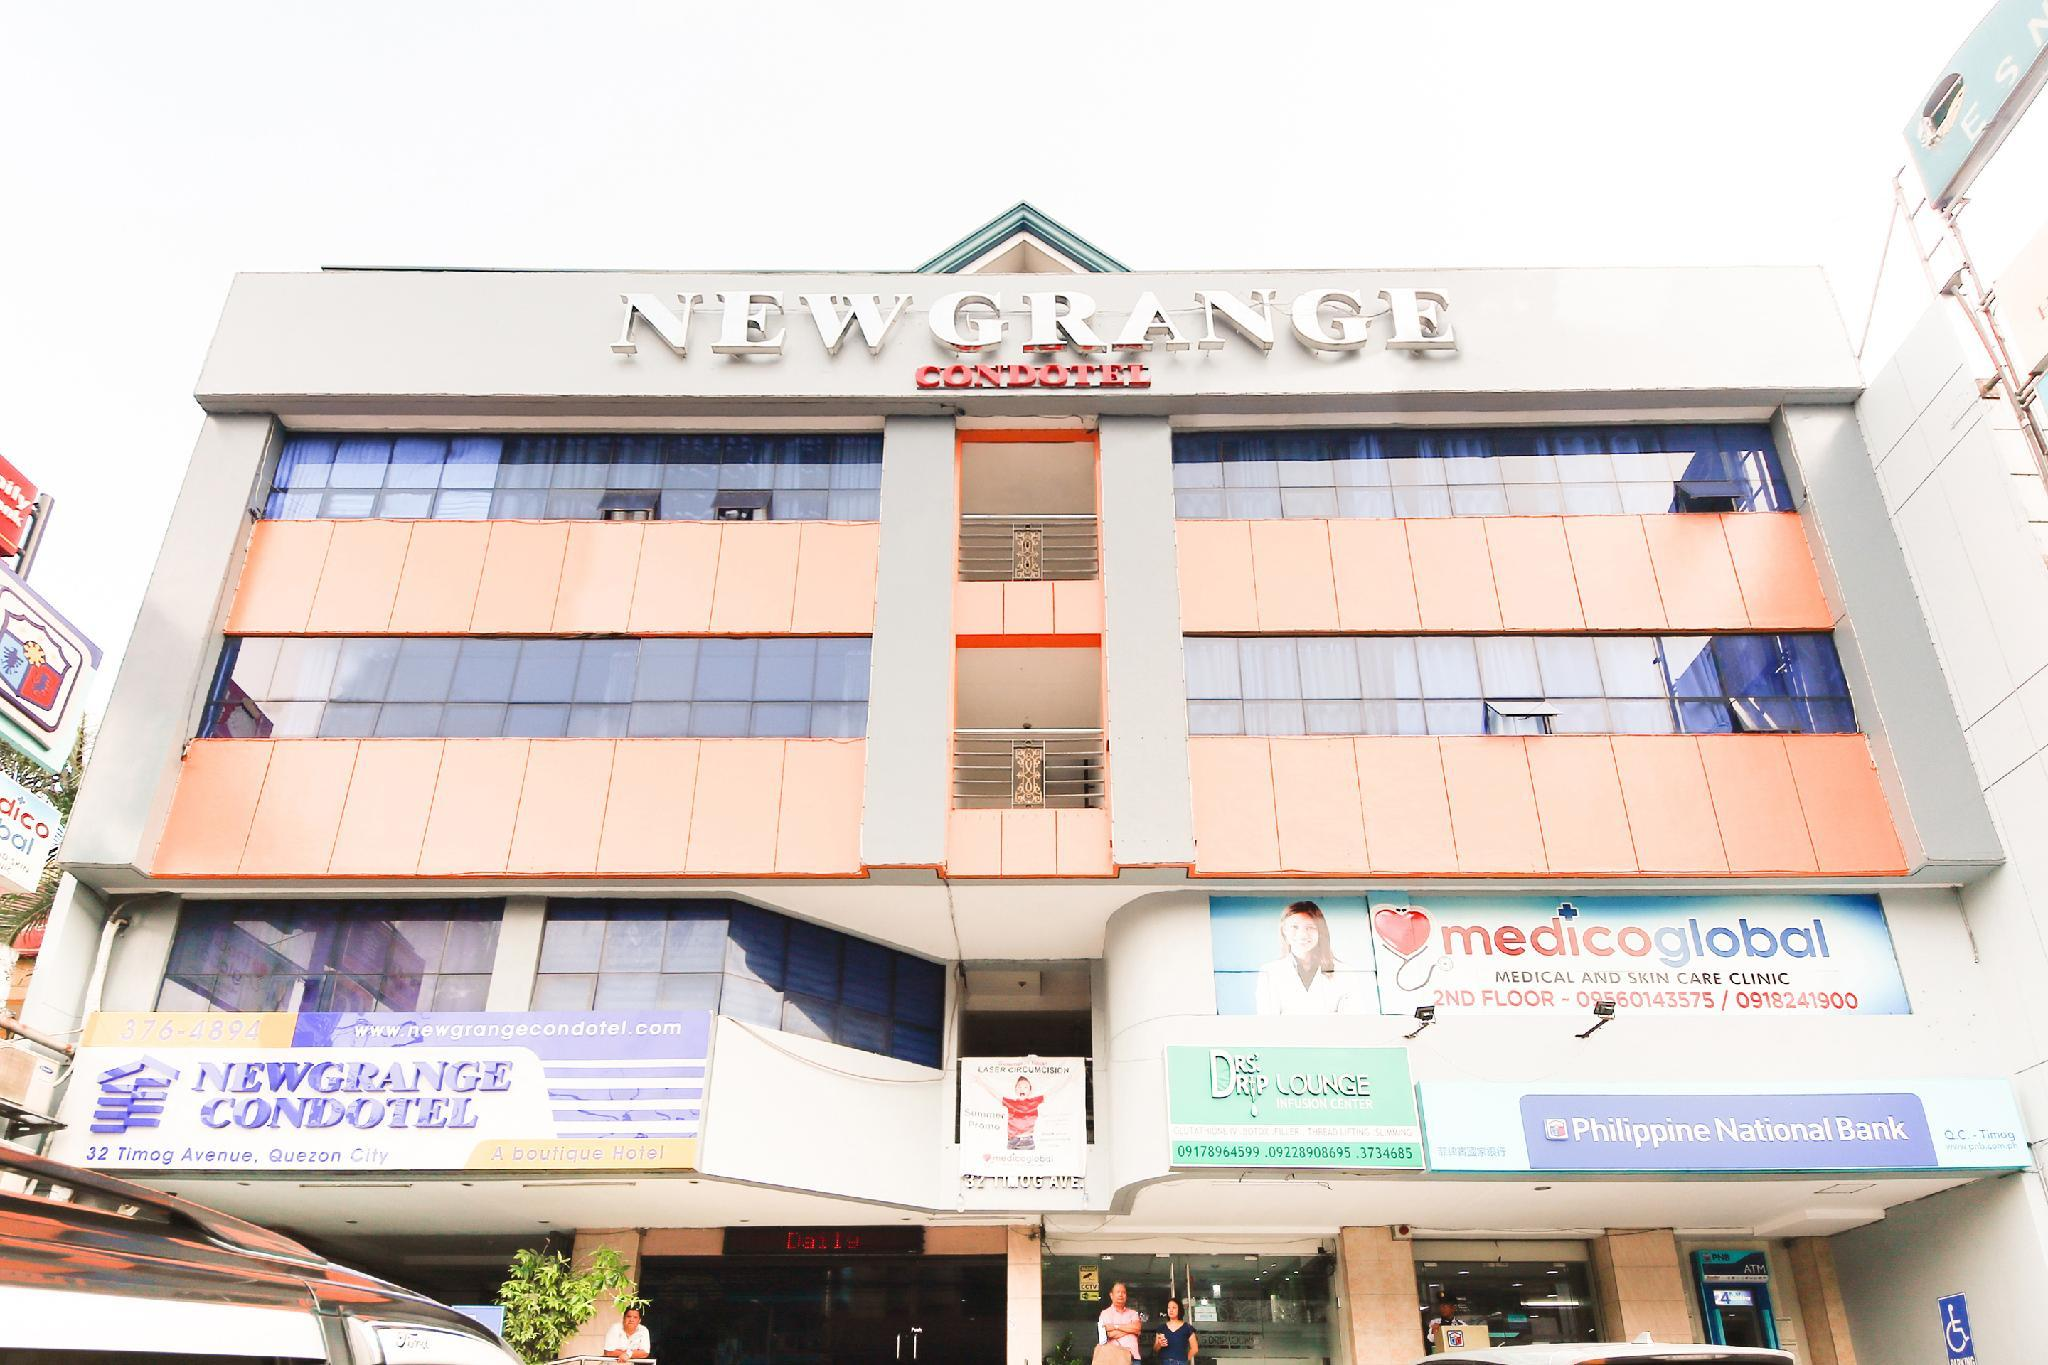 Newgrange Condotel